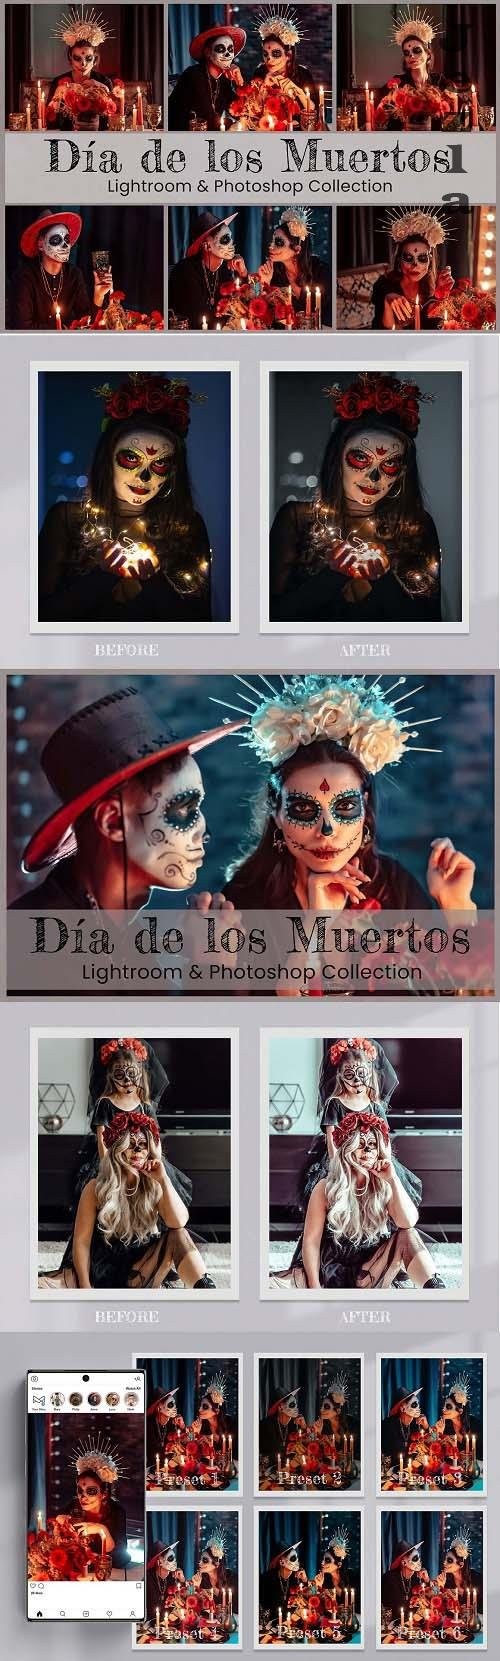 Dia de Los Muertos LRM PS LUTs - 6525741